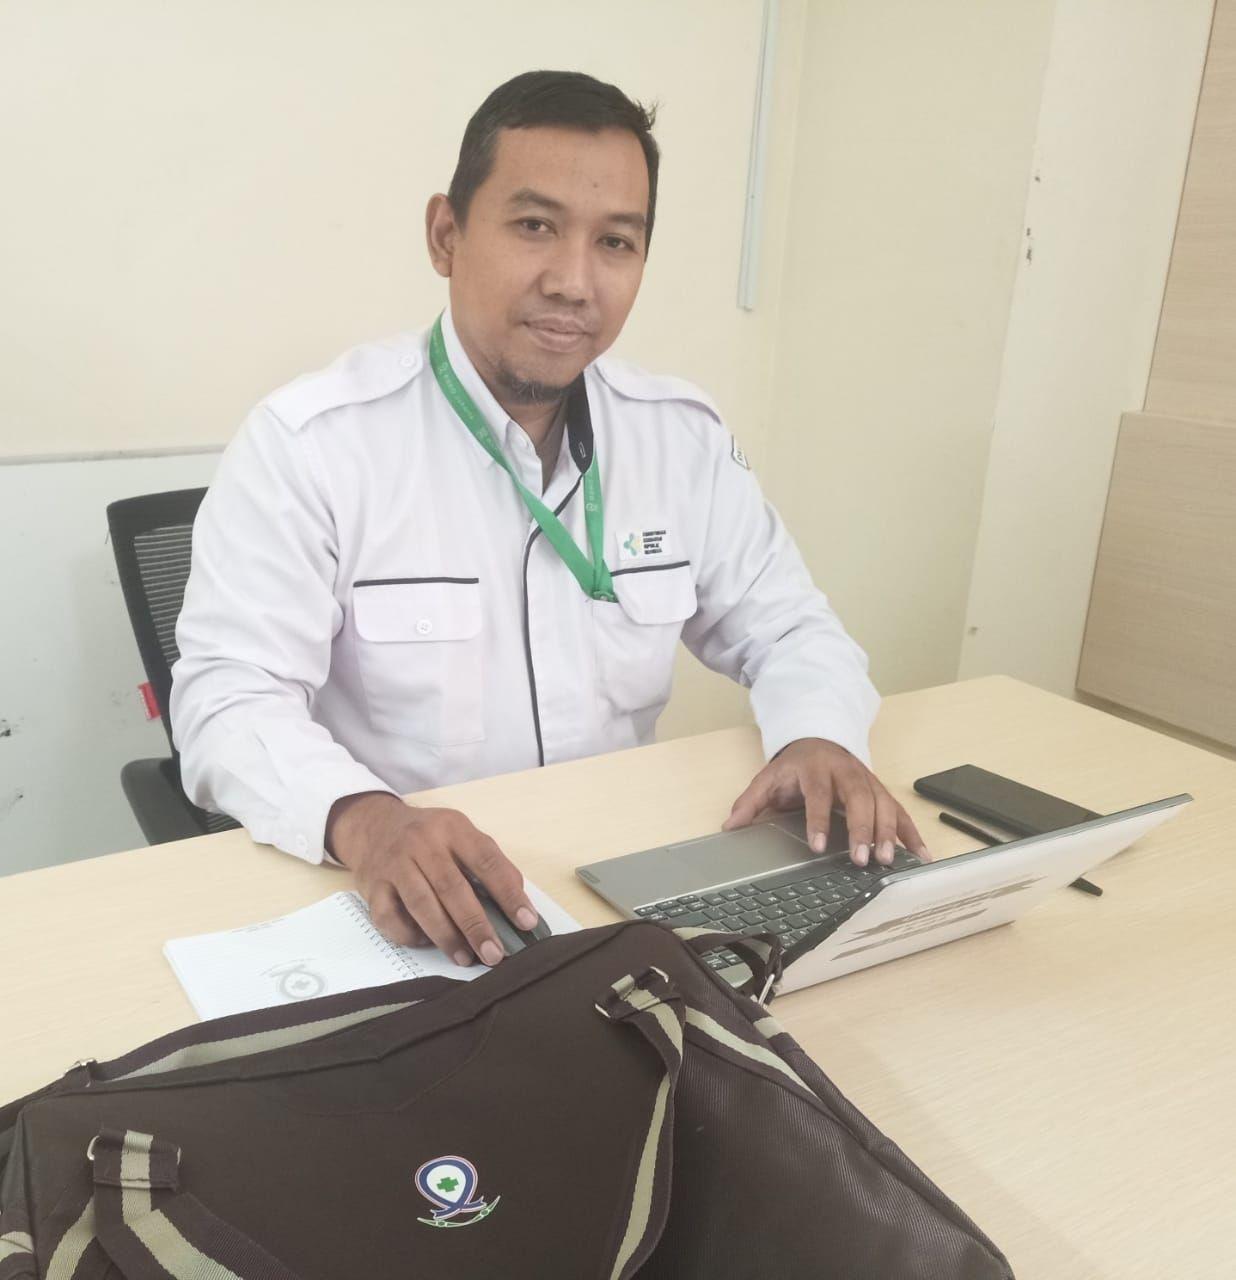 Deskripsi : Kepala Instalasi Pusat Sterilisasi dan Binatu RSKO Jakarta, Mohammad Arief Hidayat, S.Kep, RN I Sumber Foto : dokpri